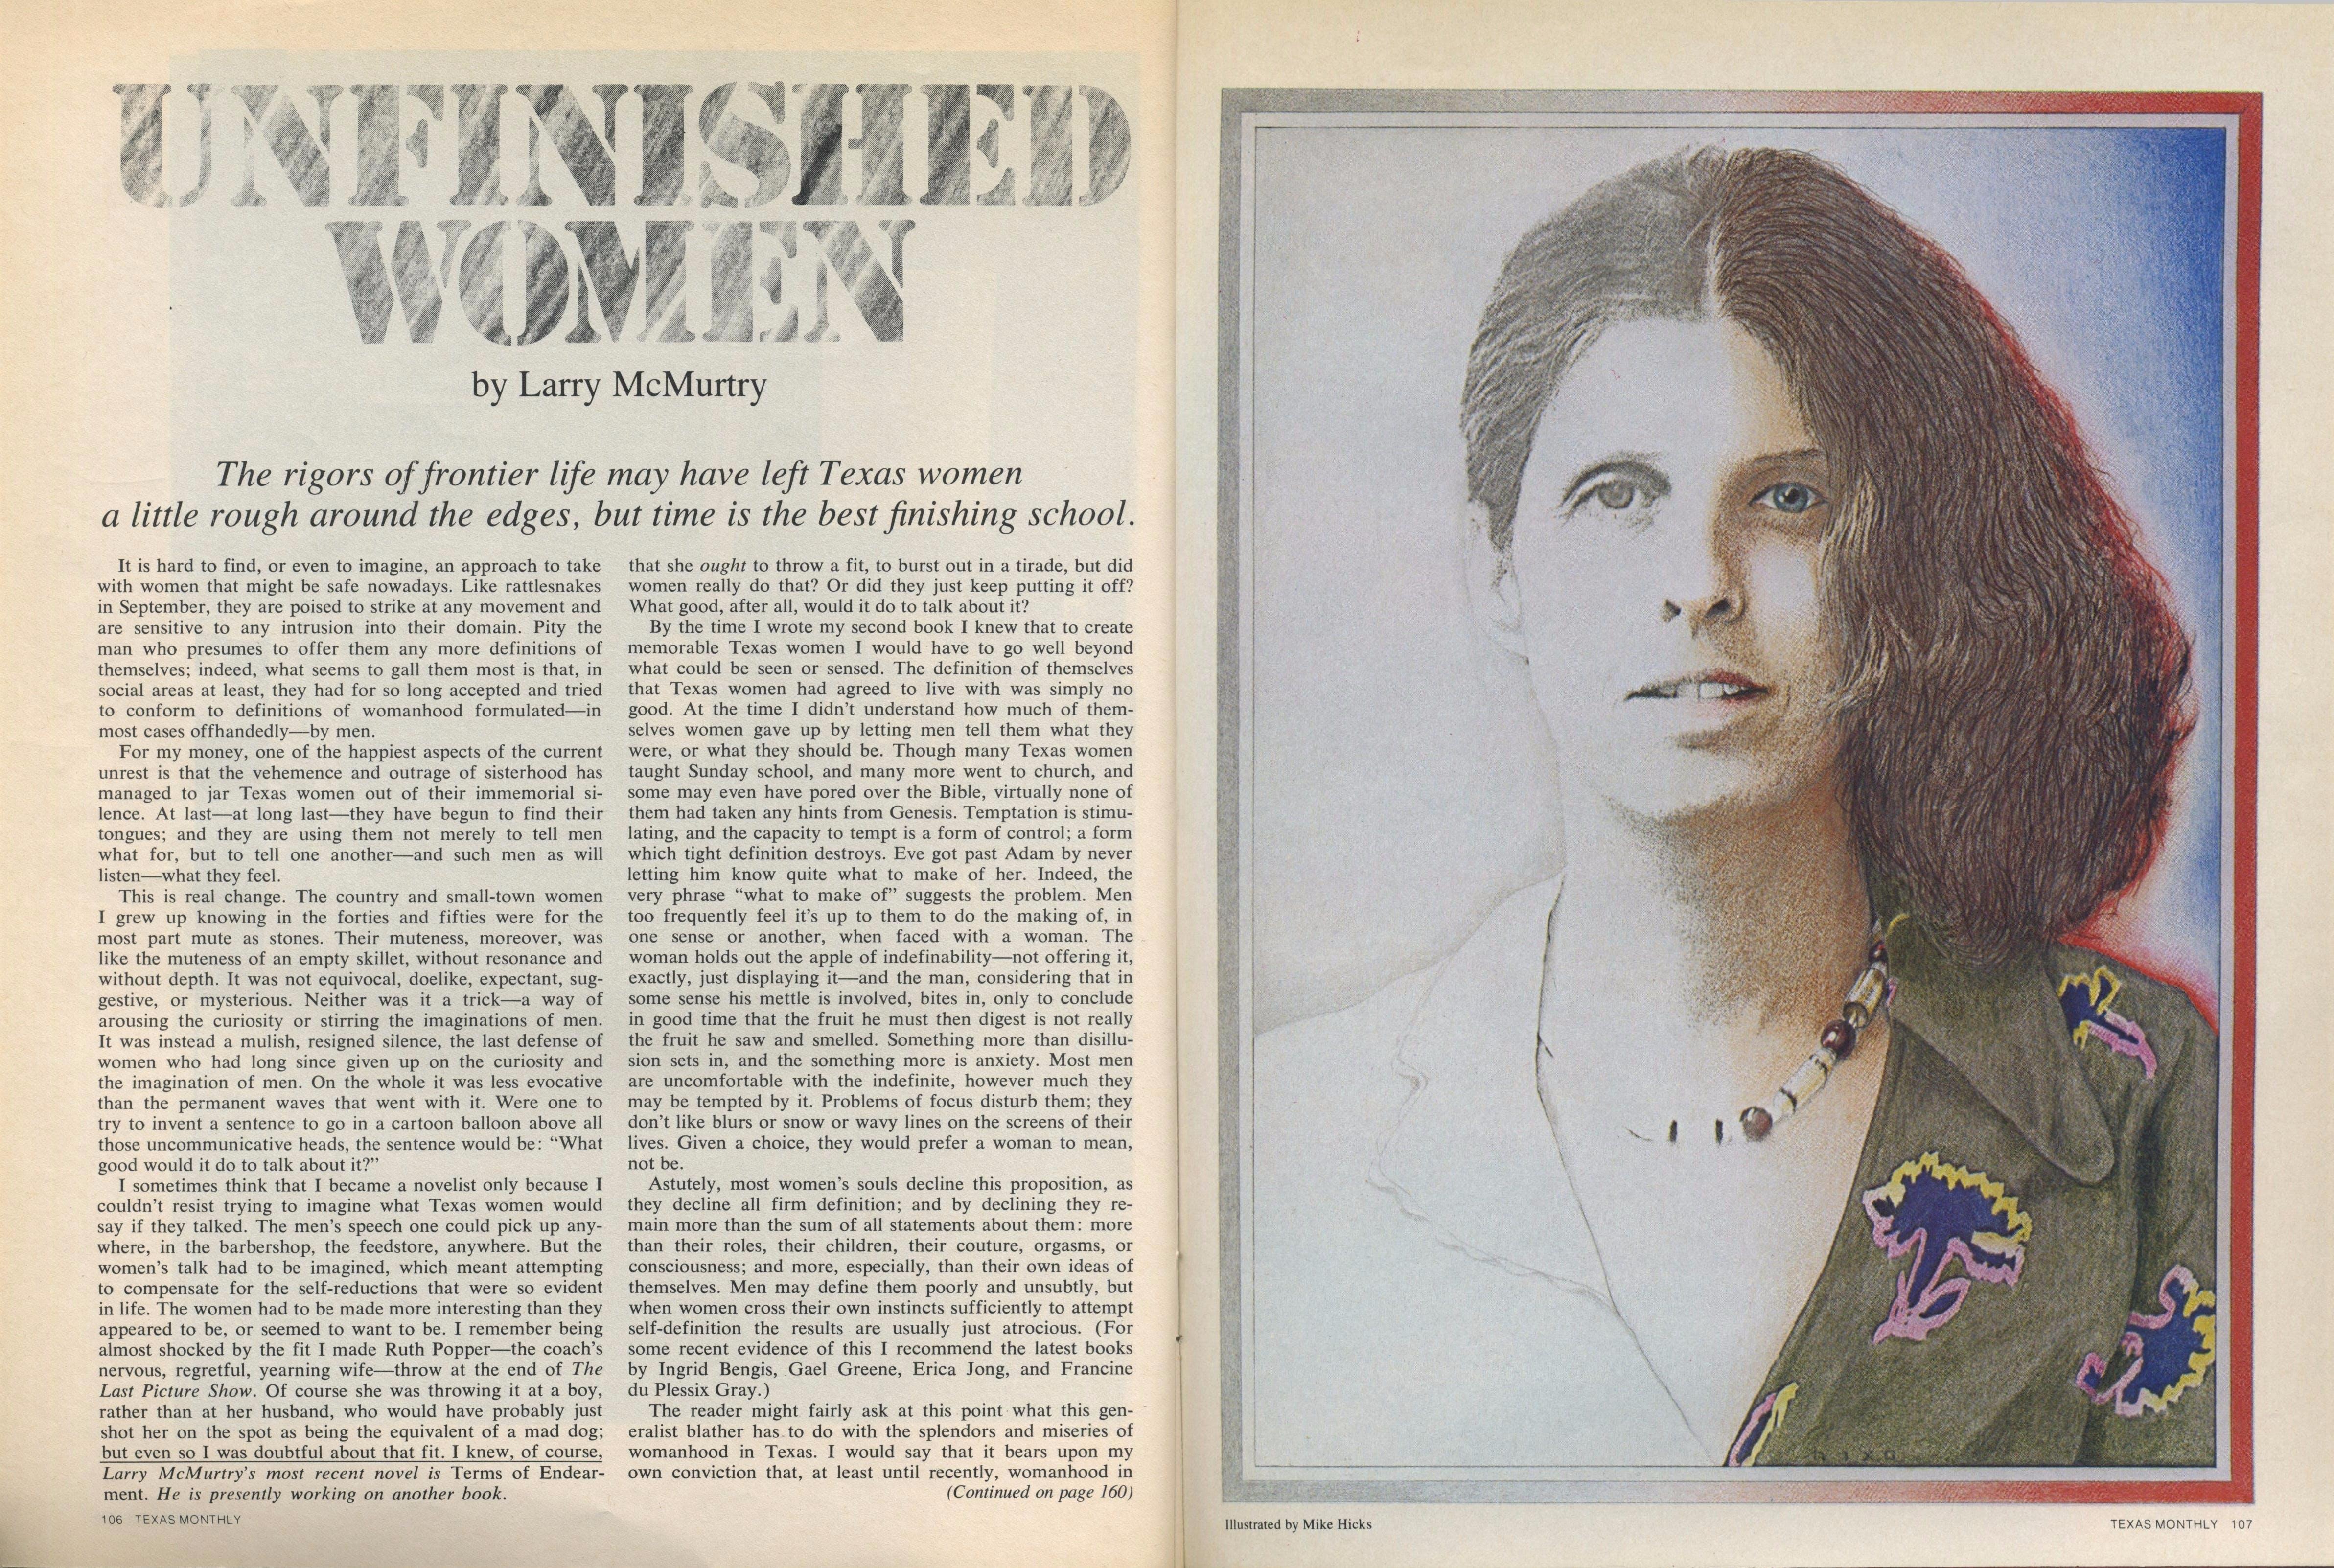 Unfinished Women